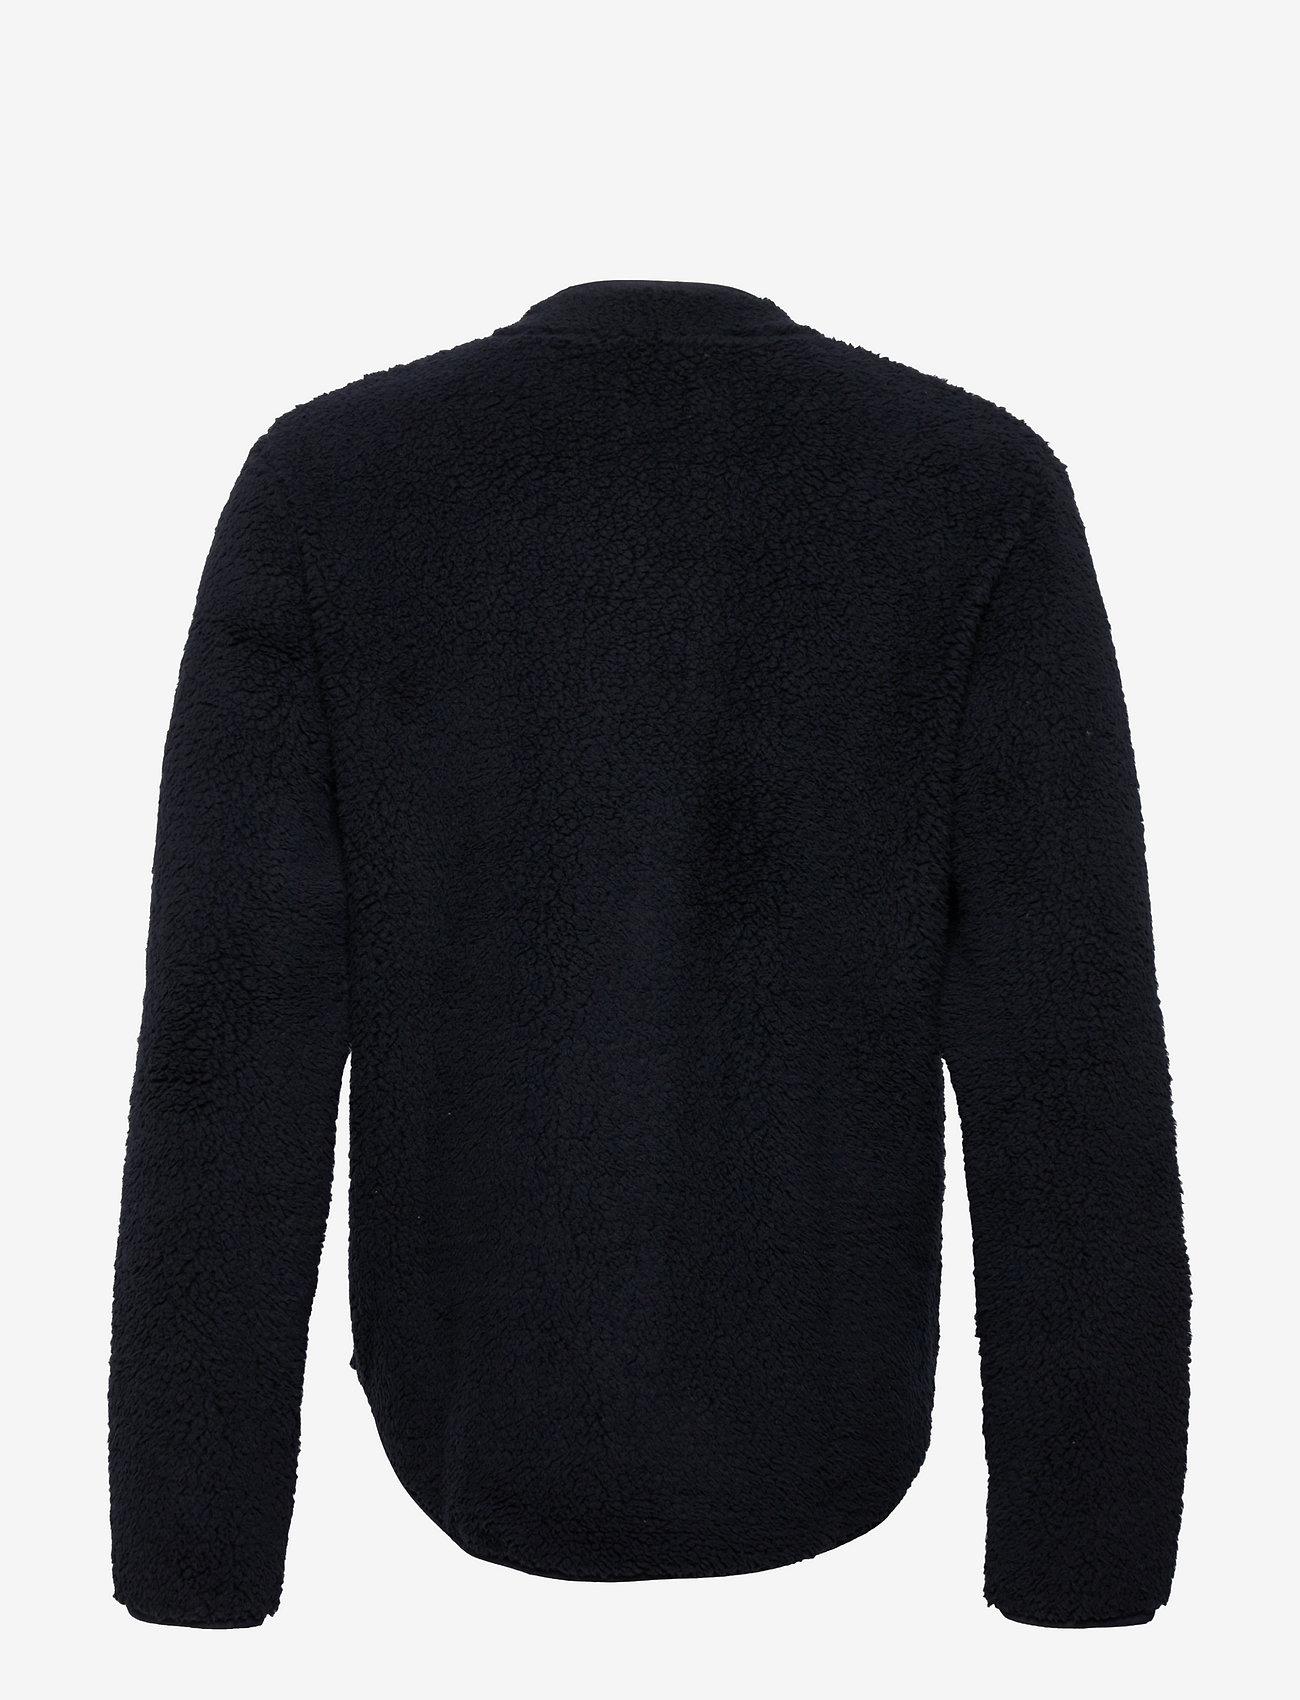 Resteröds - Original Fleece Jacket Recycle - basic-sweatshirts - svart - 1